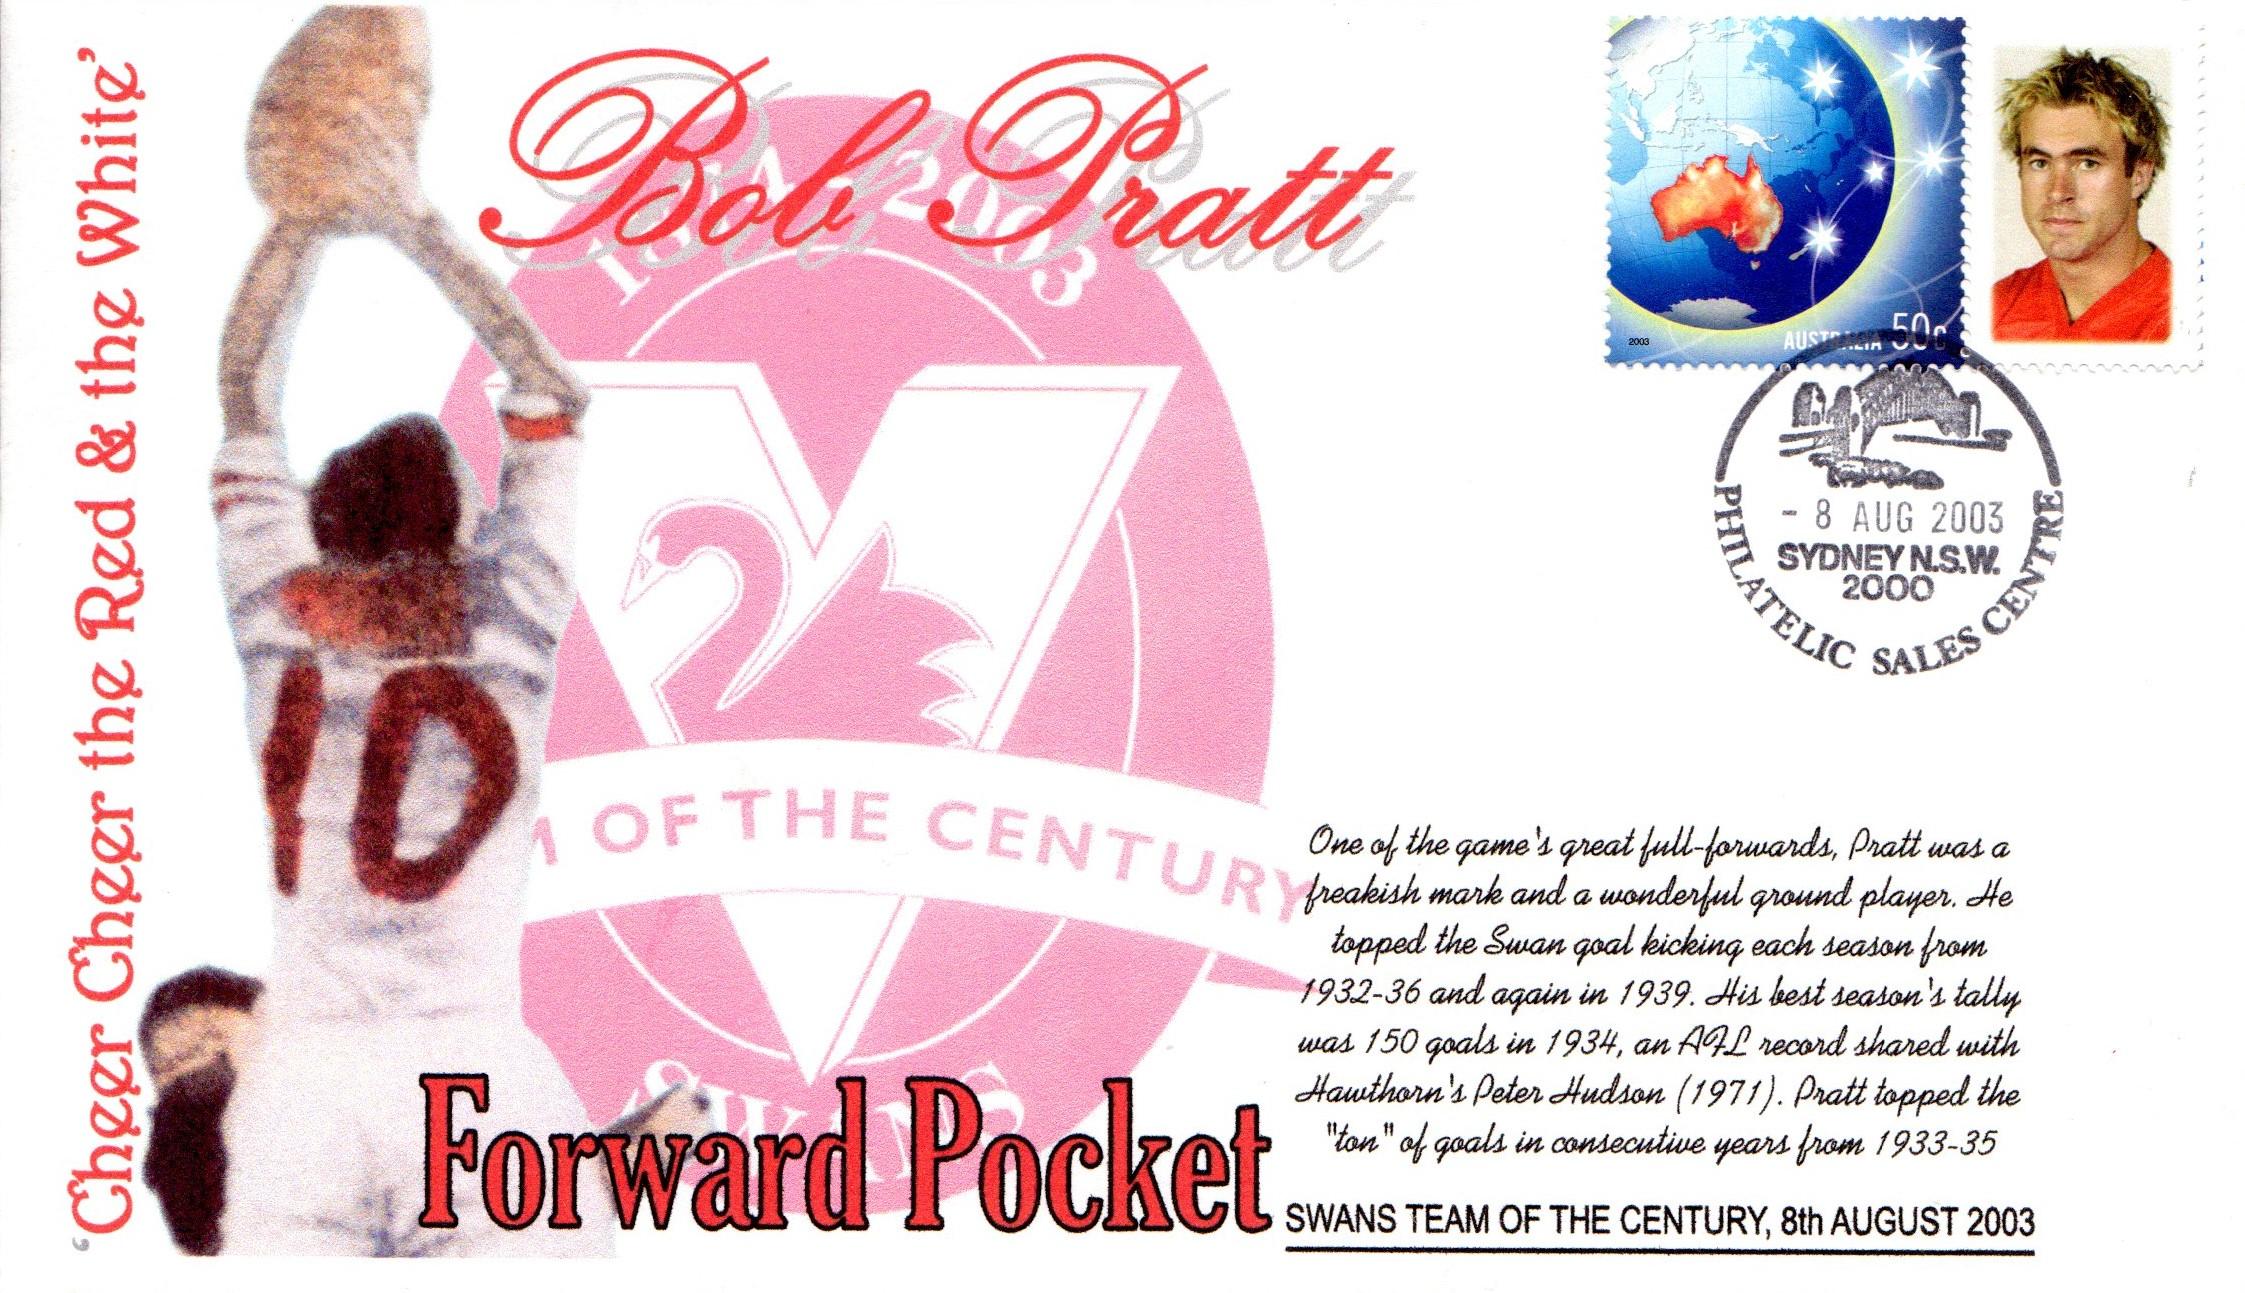 Bob Pratt